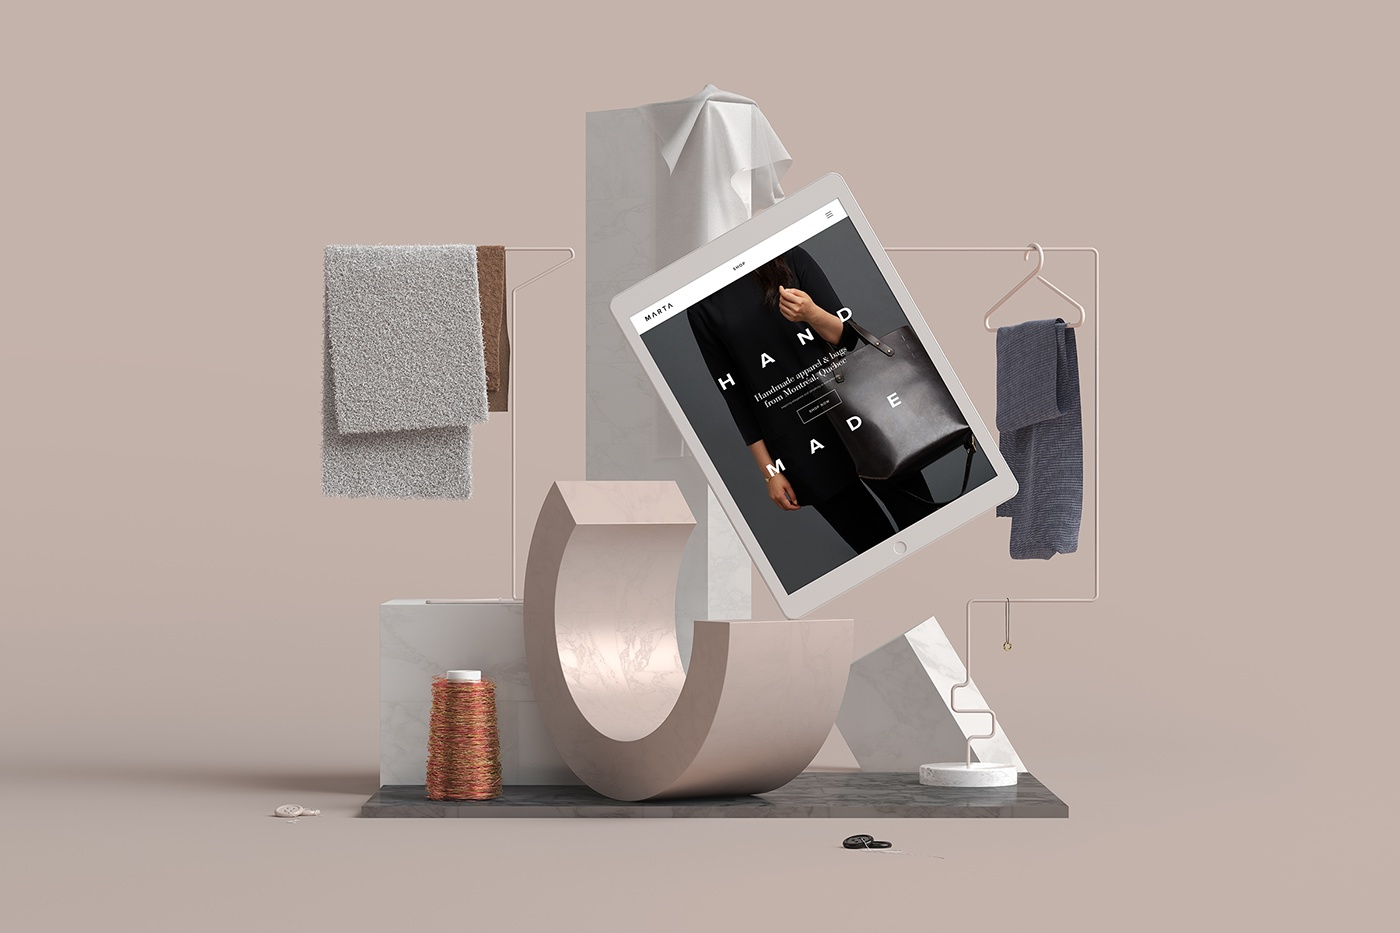 Projet design 3D Squarespace Stillife de MVSM